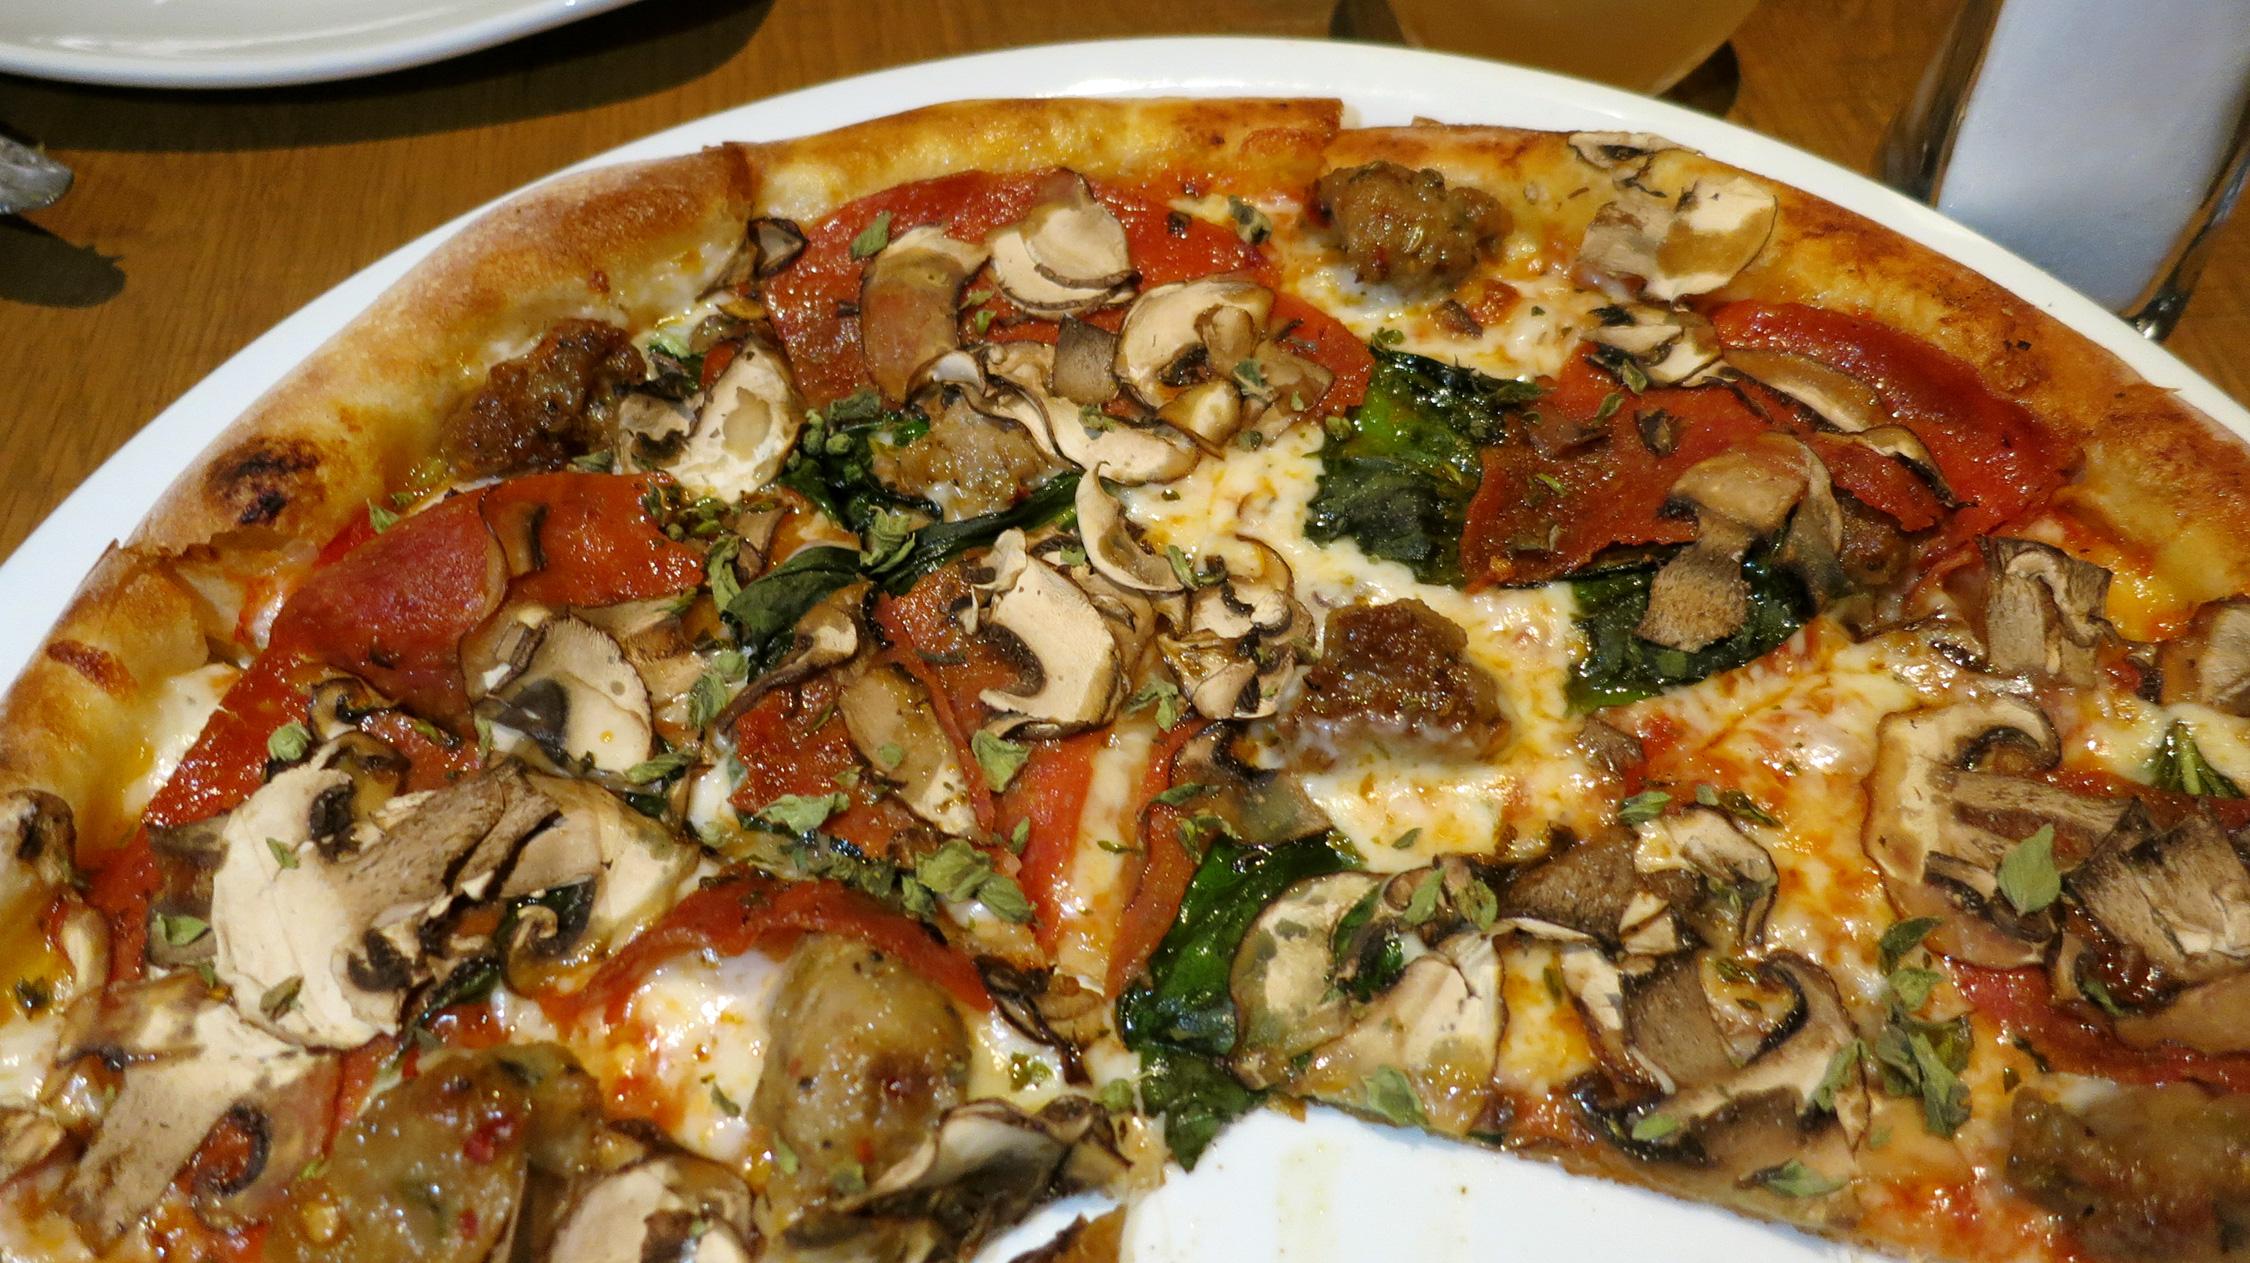 California Pizza Kitchen Hand Tossed Wild Mushroom Pizza